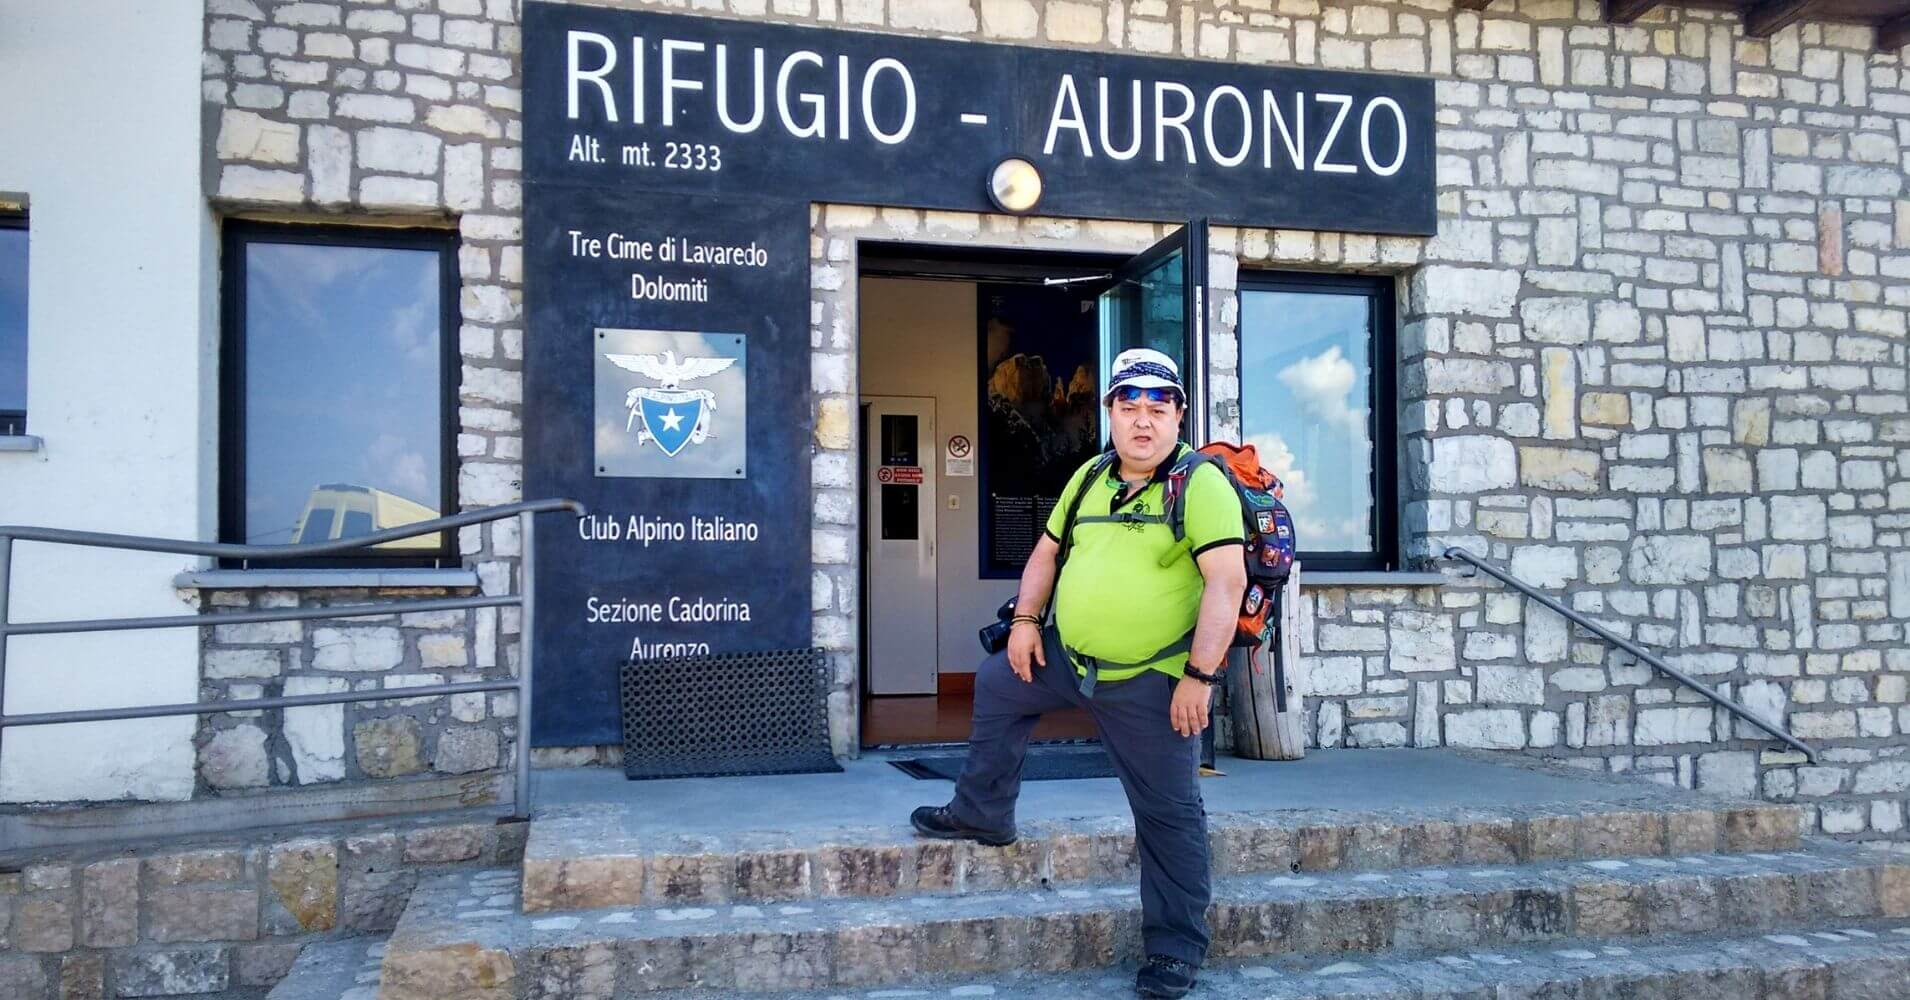 Rifugio de Auronzo. Tres Cimas di Lavaredo. Alpes Dolomitas. Belluno, Véneto. Italia.